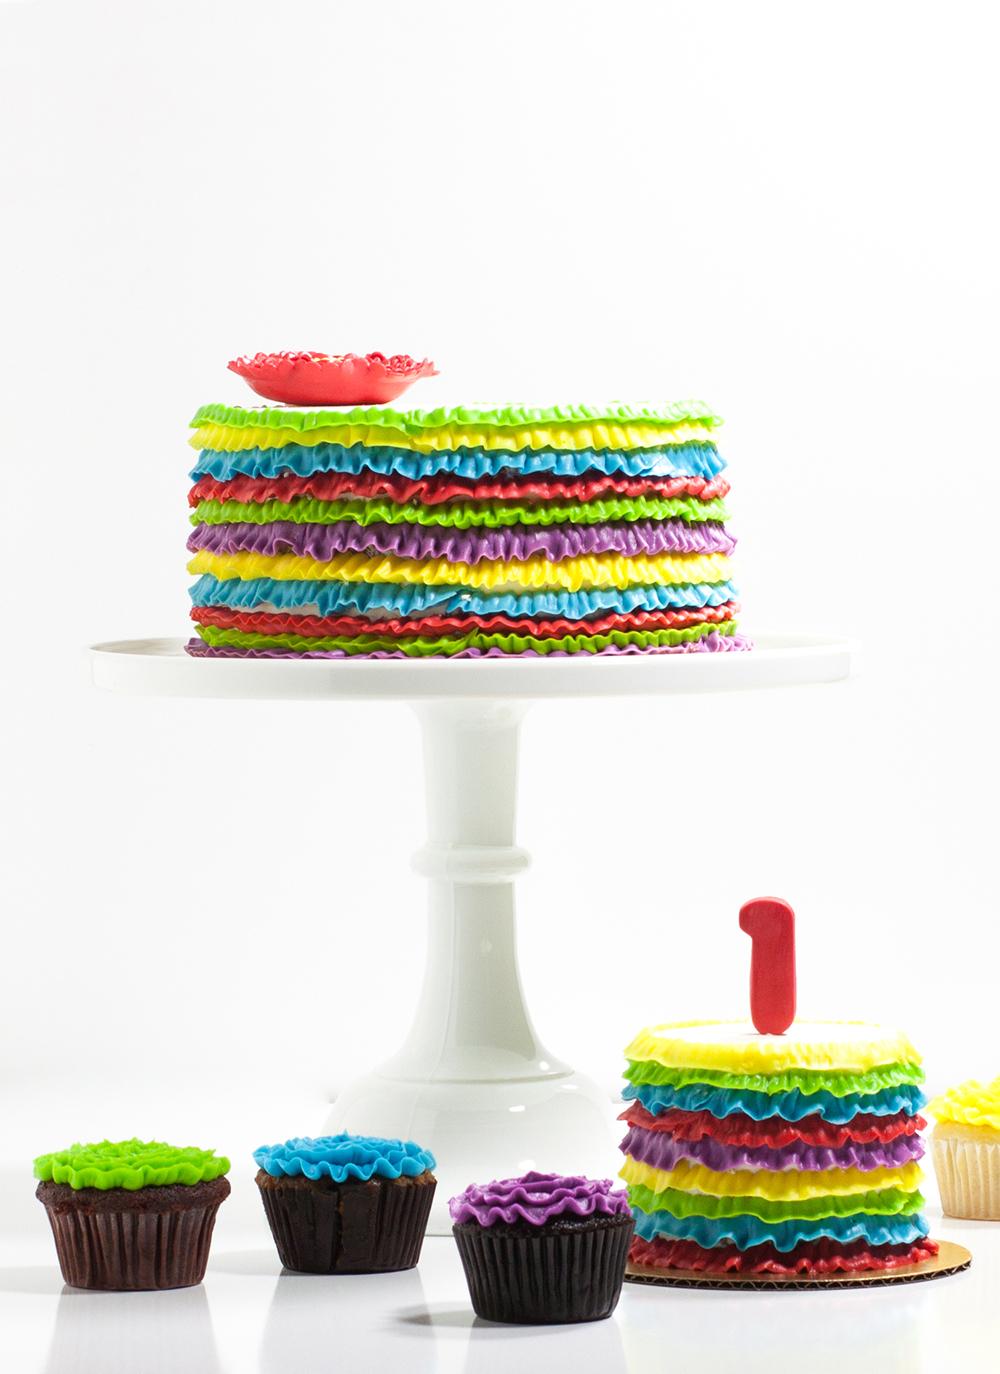 ruffled-first-birthday-cakes-main-whipped-bakeshop